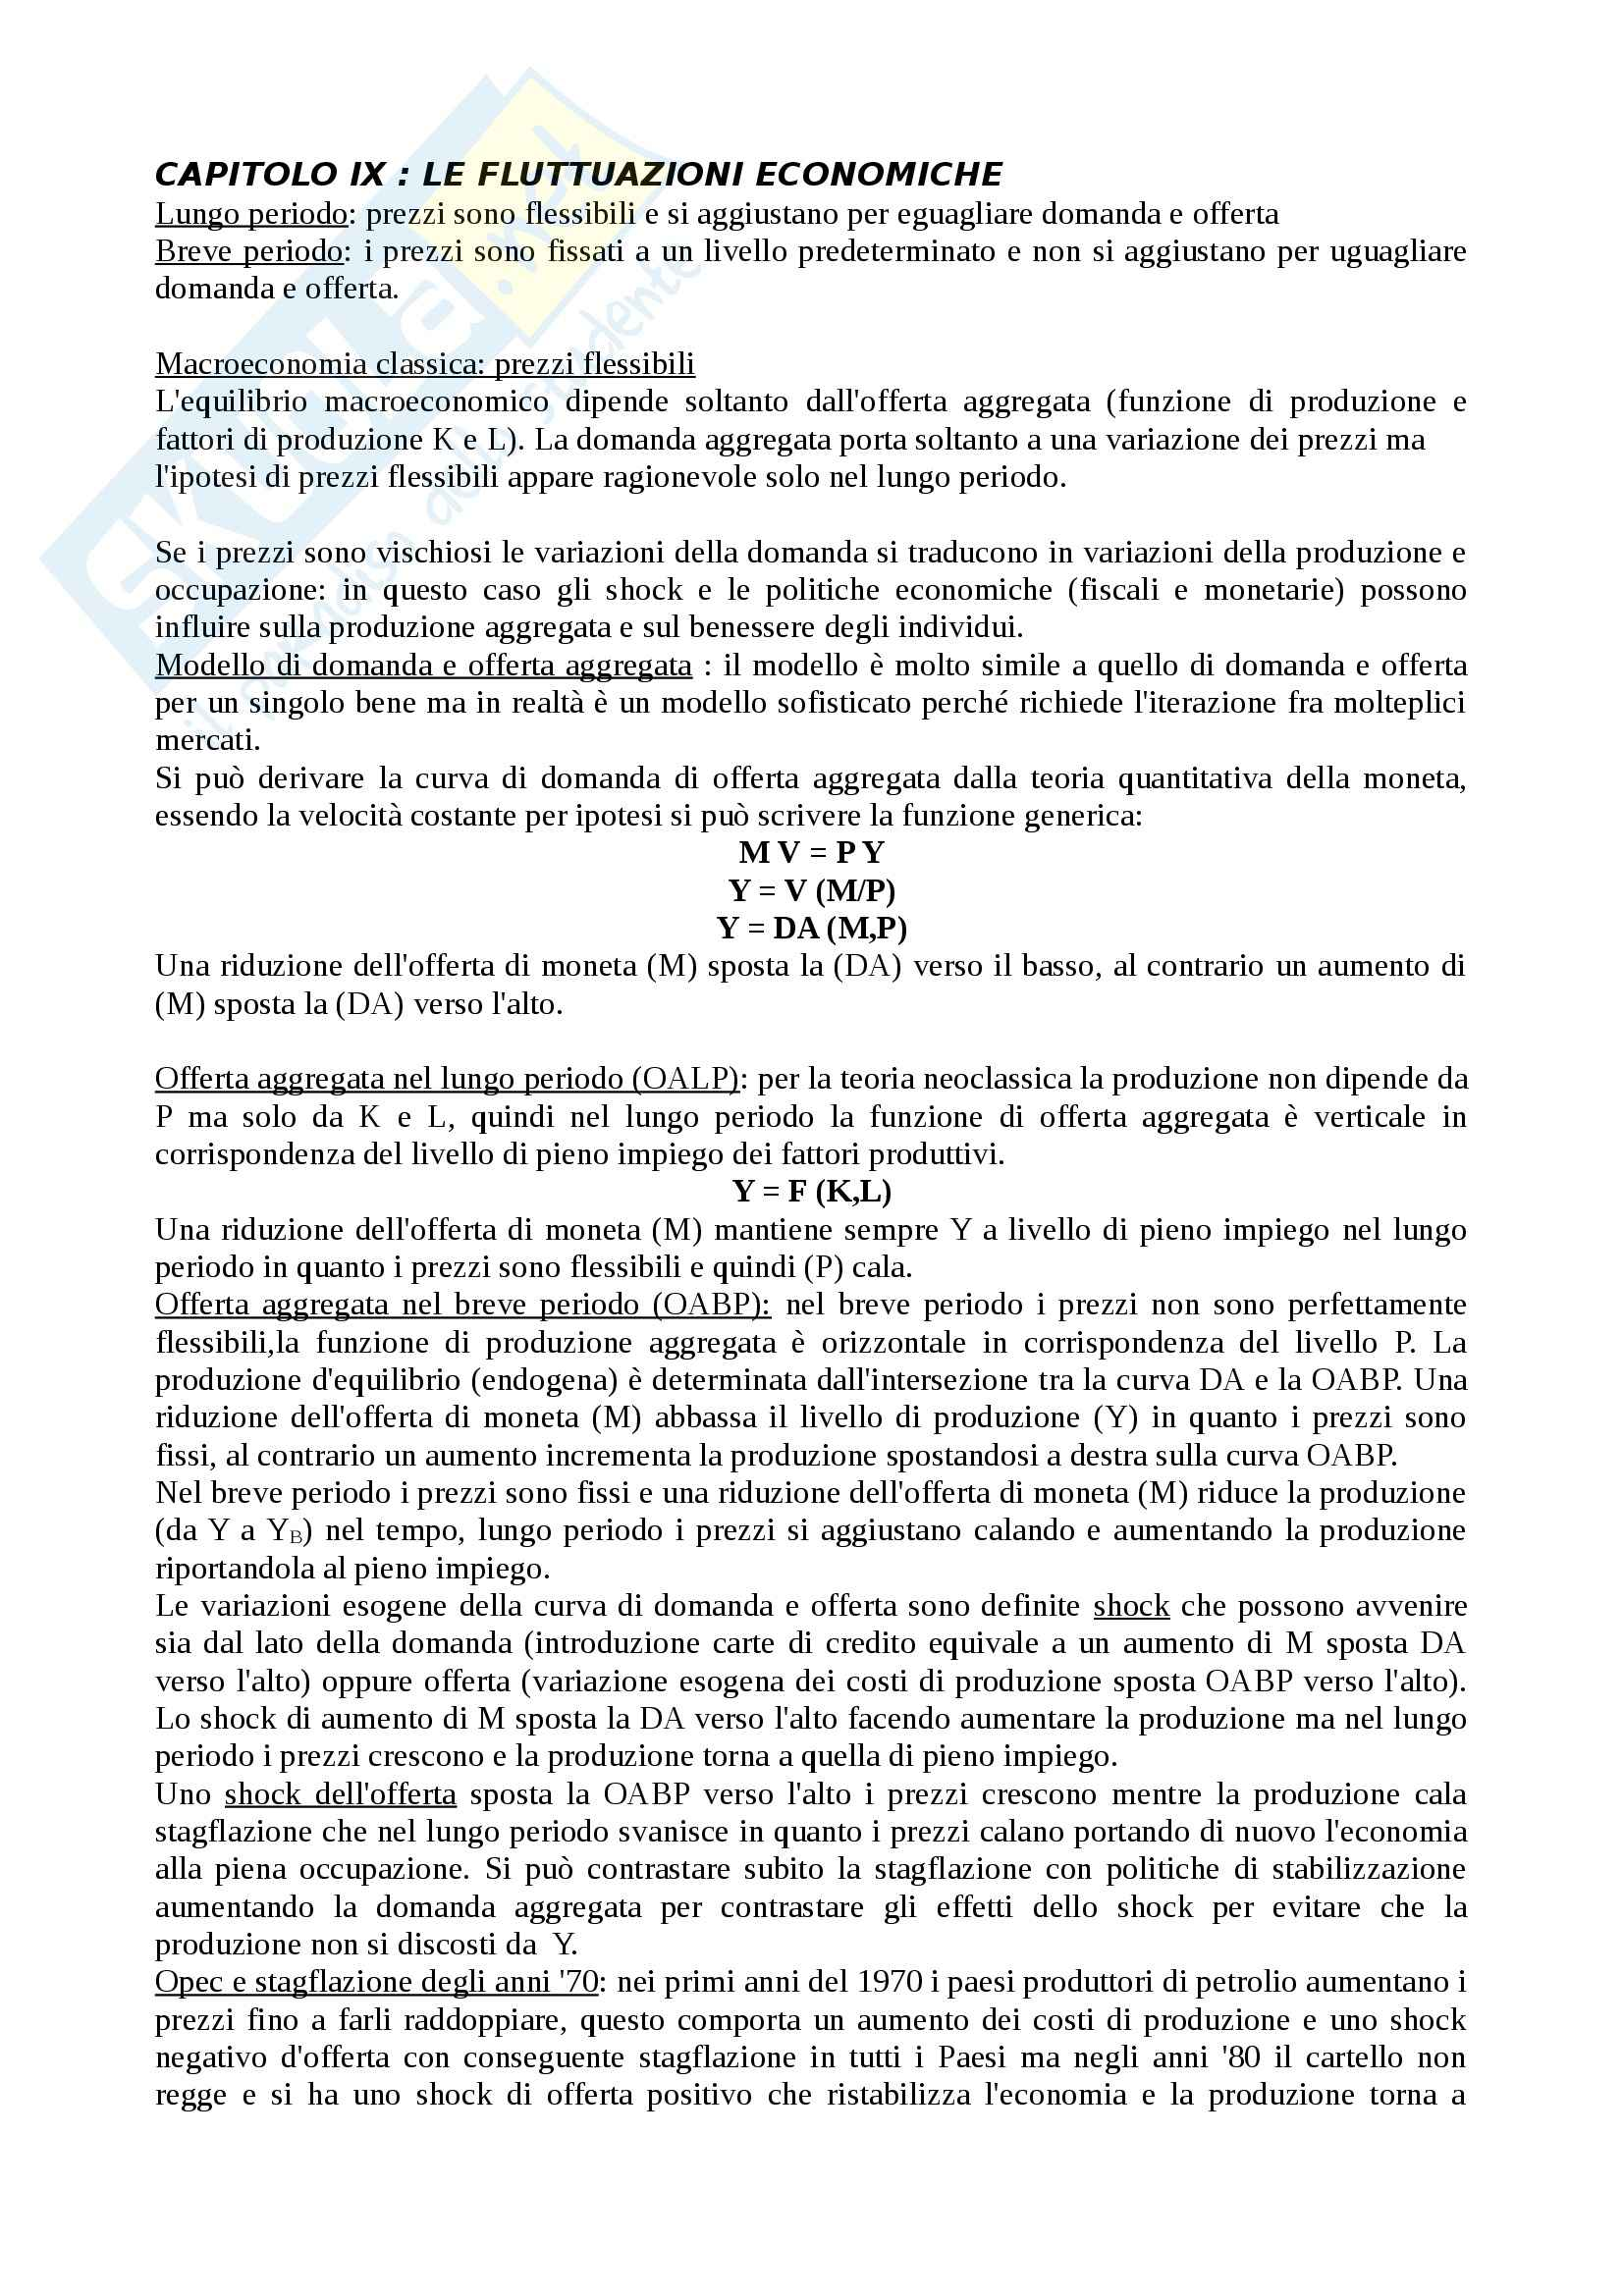 Macroeconomia - Appunti II° Parziale